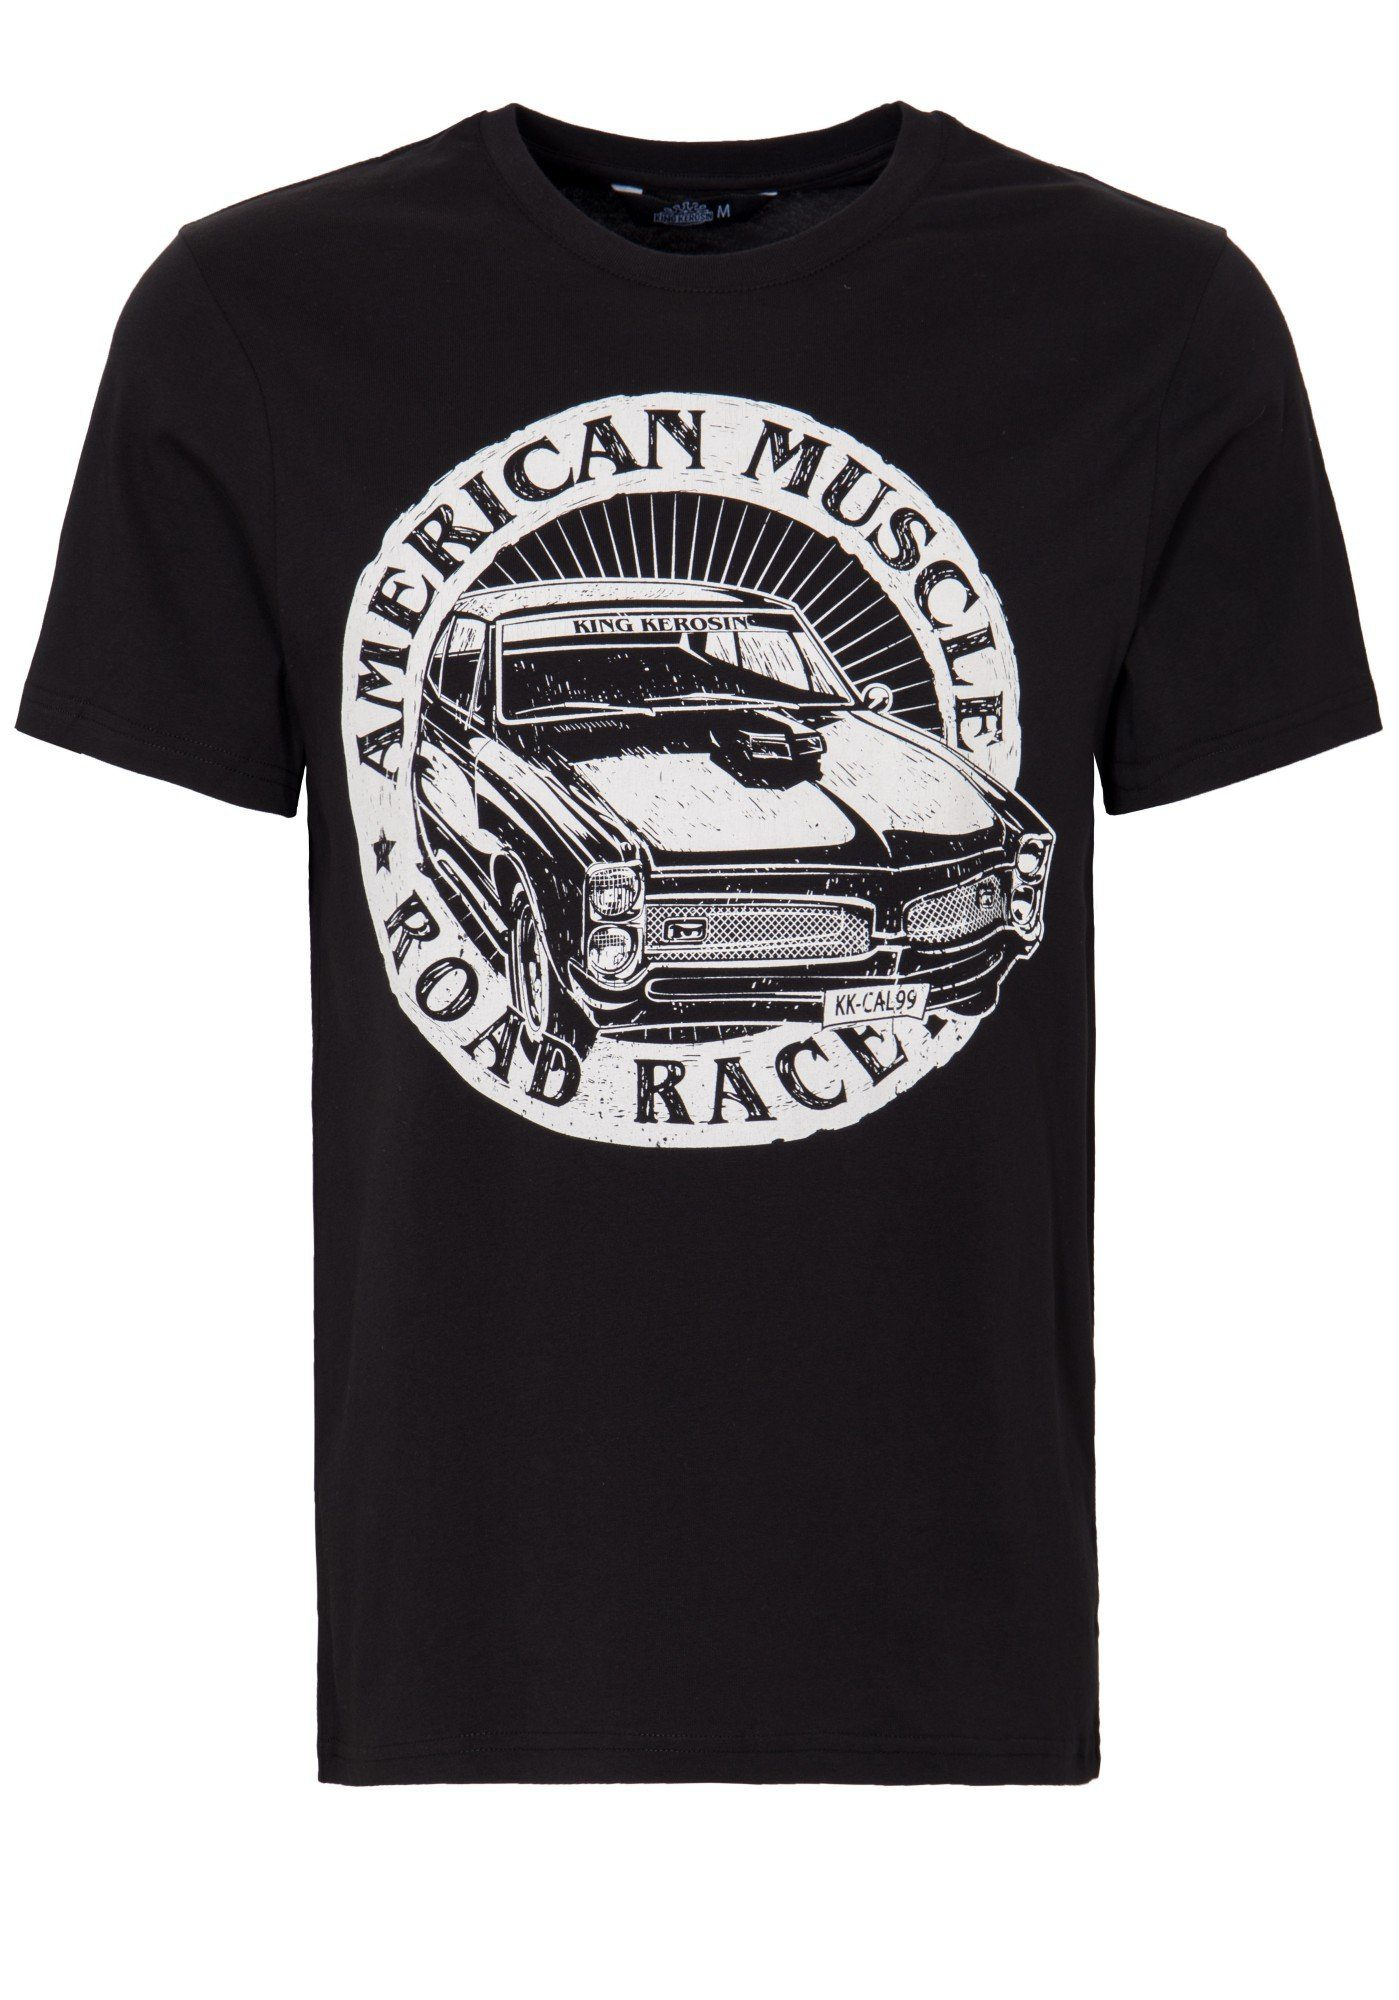 KingKerosin T-Shirt »American Muscle« | Bekleidung > Shirts > T-Shirts | Schwarz | Jersey - Jeans | KINGKEROSIN